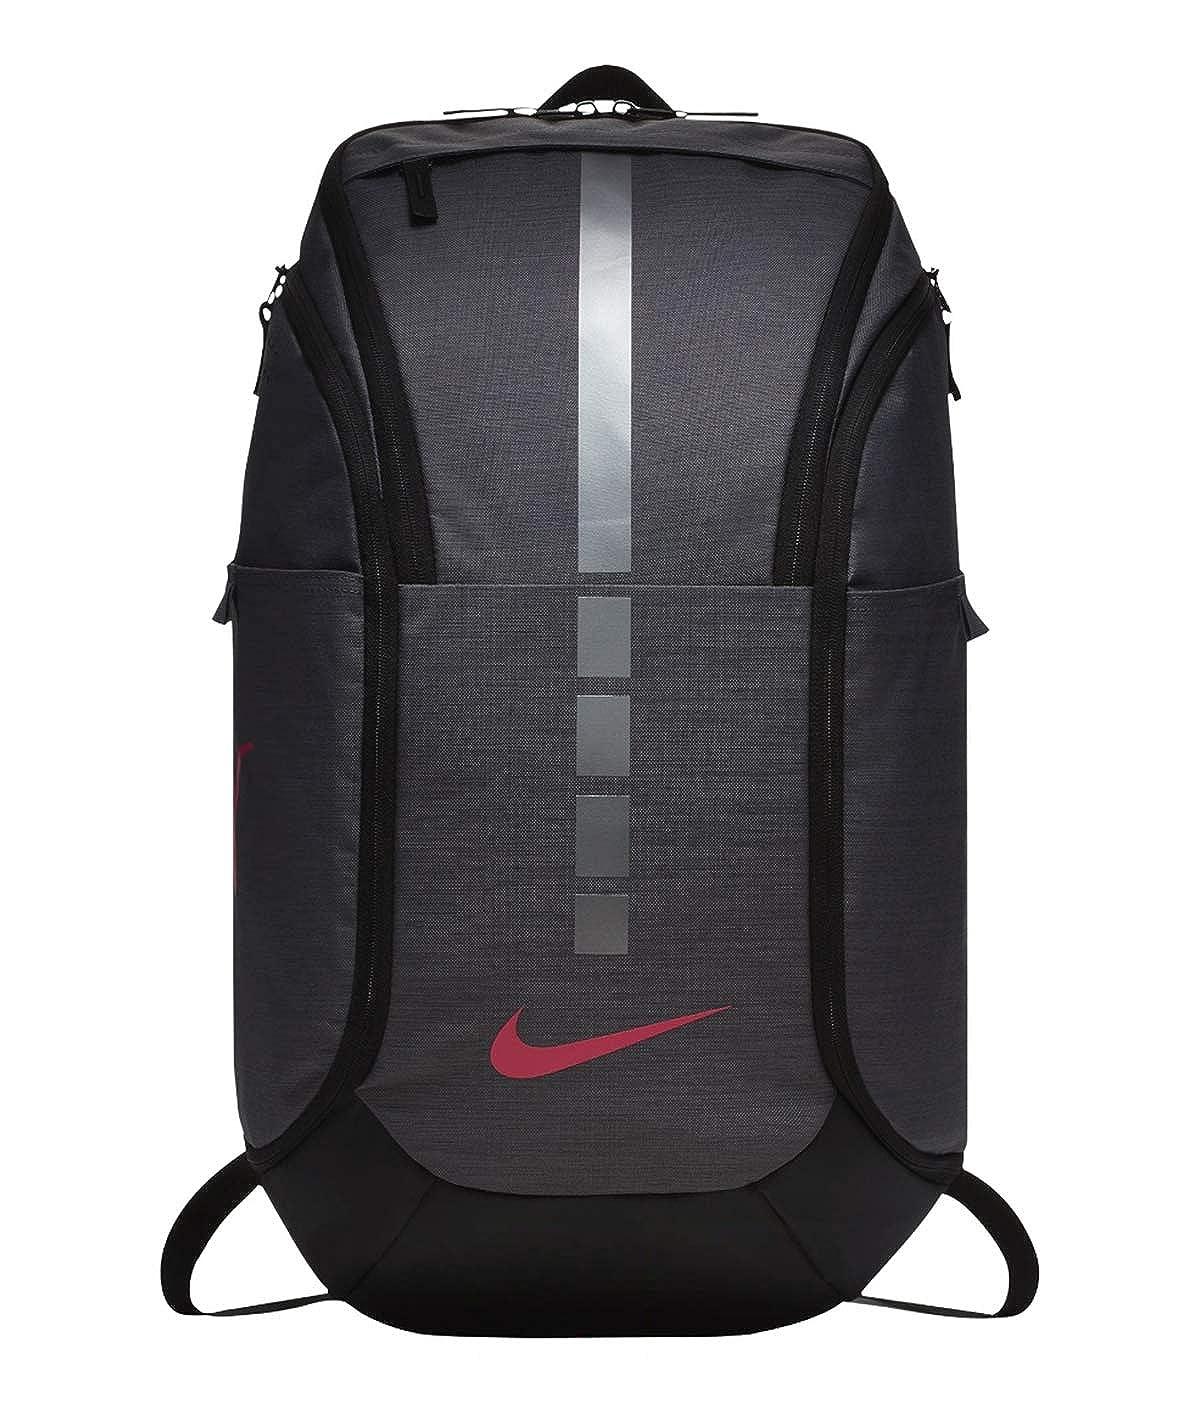 85bec6a5125bb Nike Mens NK HPS ELT PRO BKPK BA5554-021 - DARK GREY/BLACK/VIVID PINK